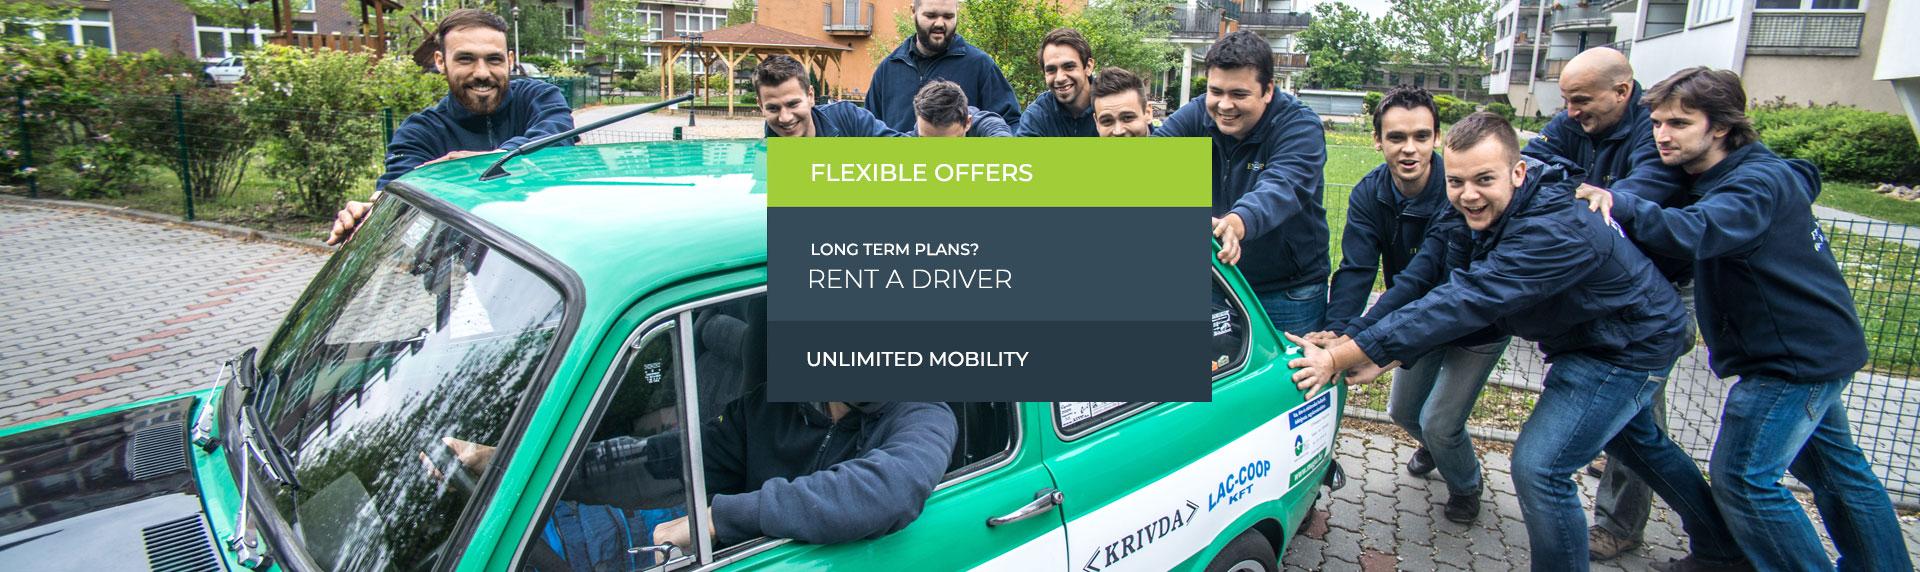 Flexible offers